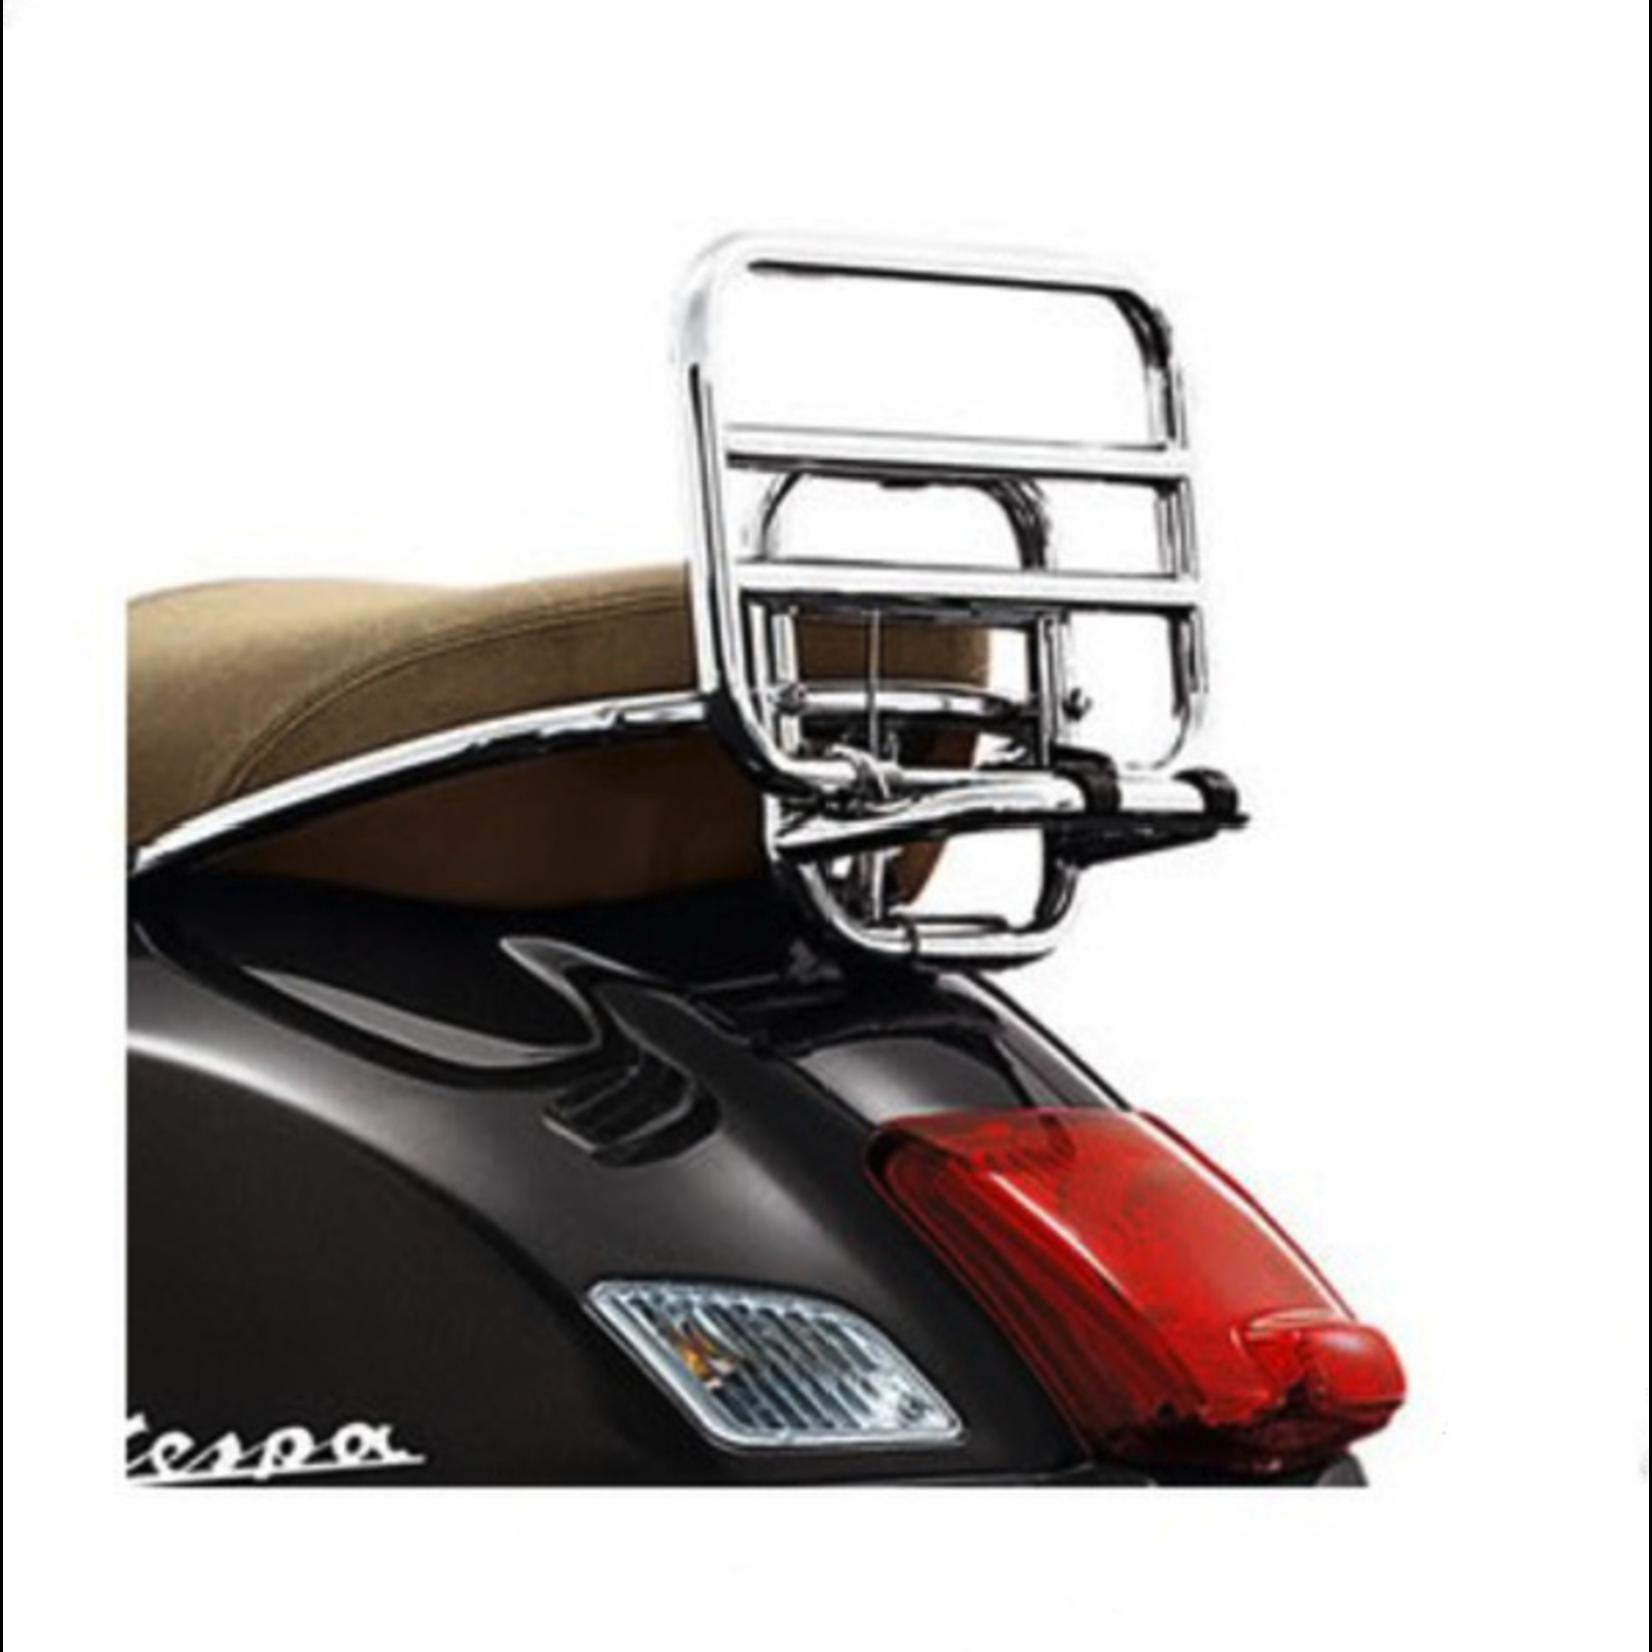 Accessories Rack, GTS Super Rear OEM Chrome Folding